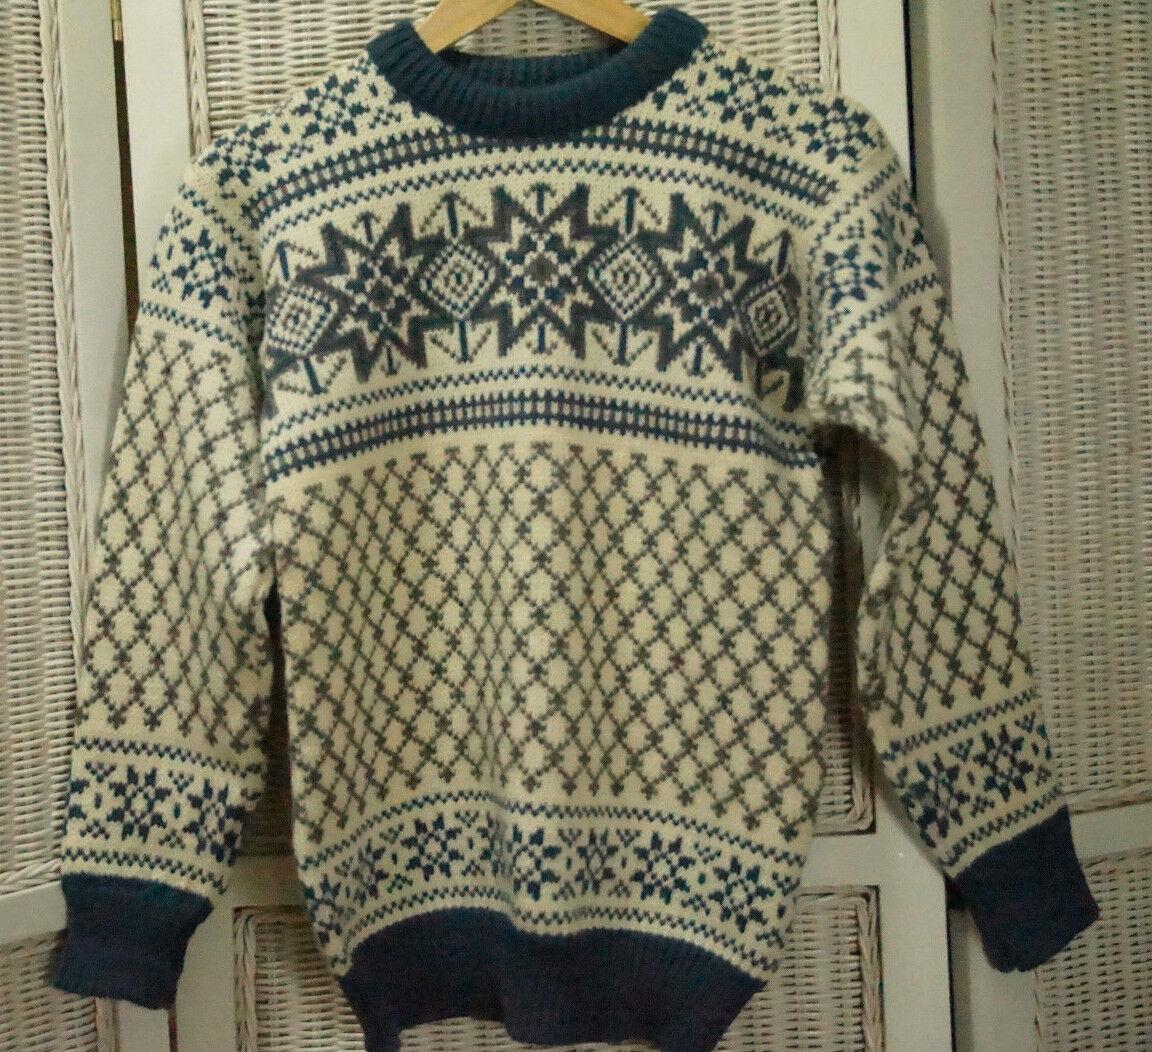 DALE OF NORWAY Nordic Jumper S-M S-M S-M 35  Bust Scandinavian Norwegian Wool Sweater 5af117